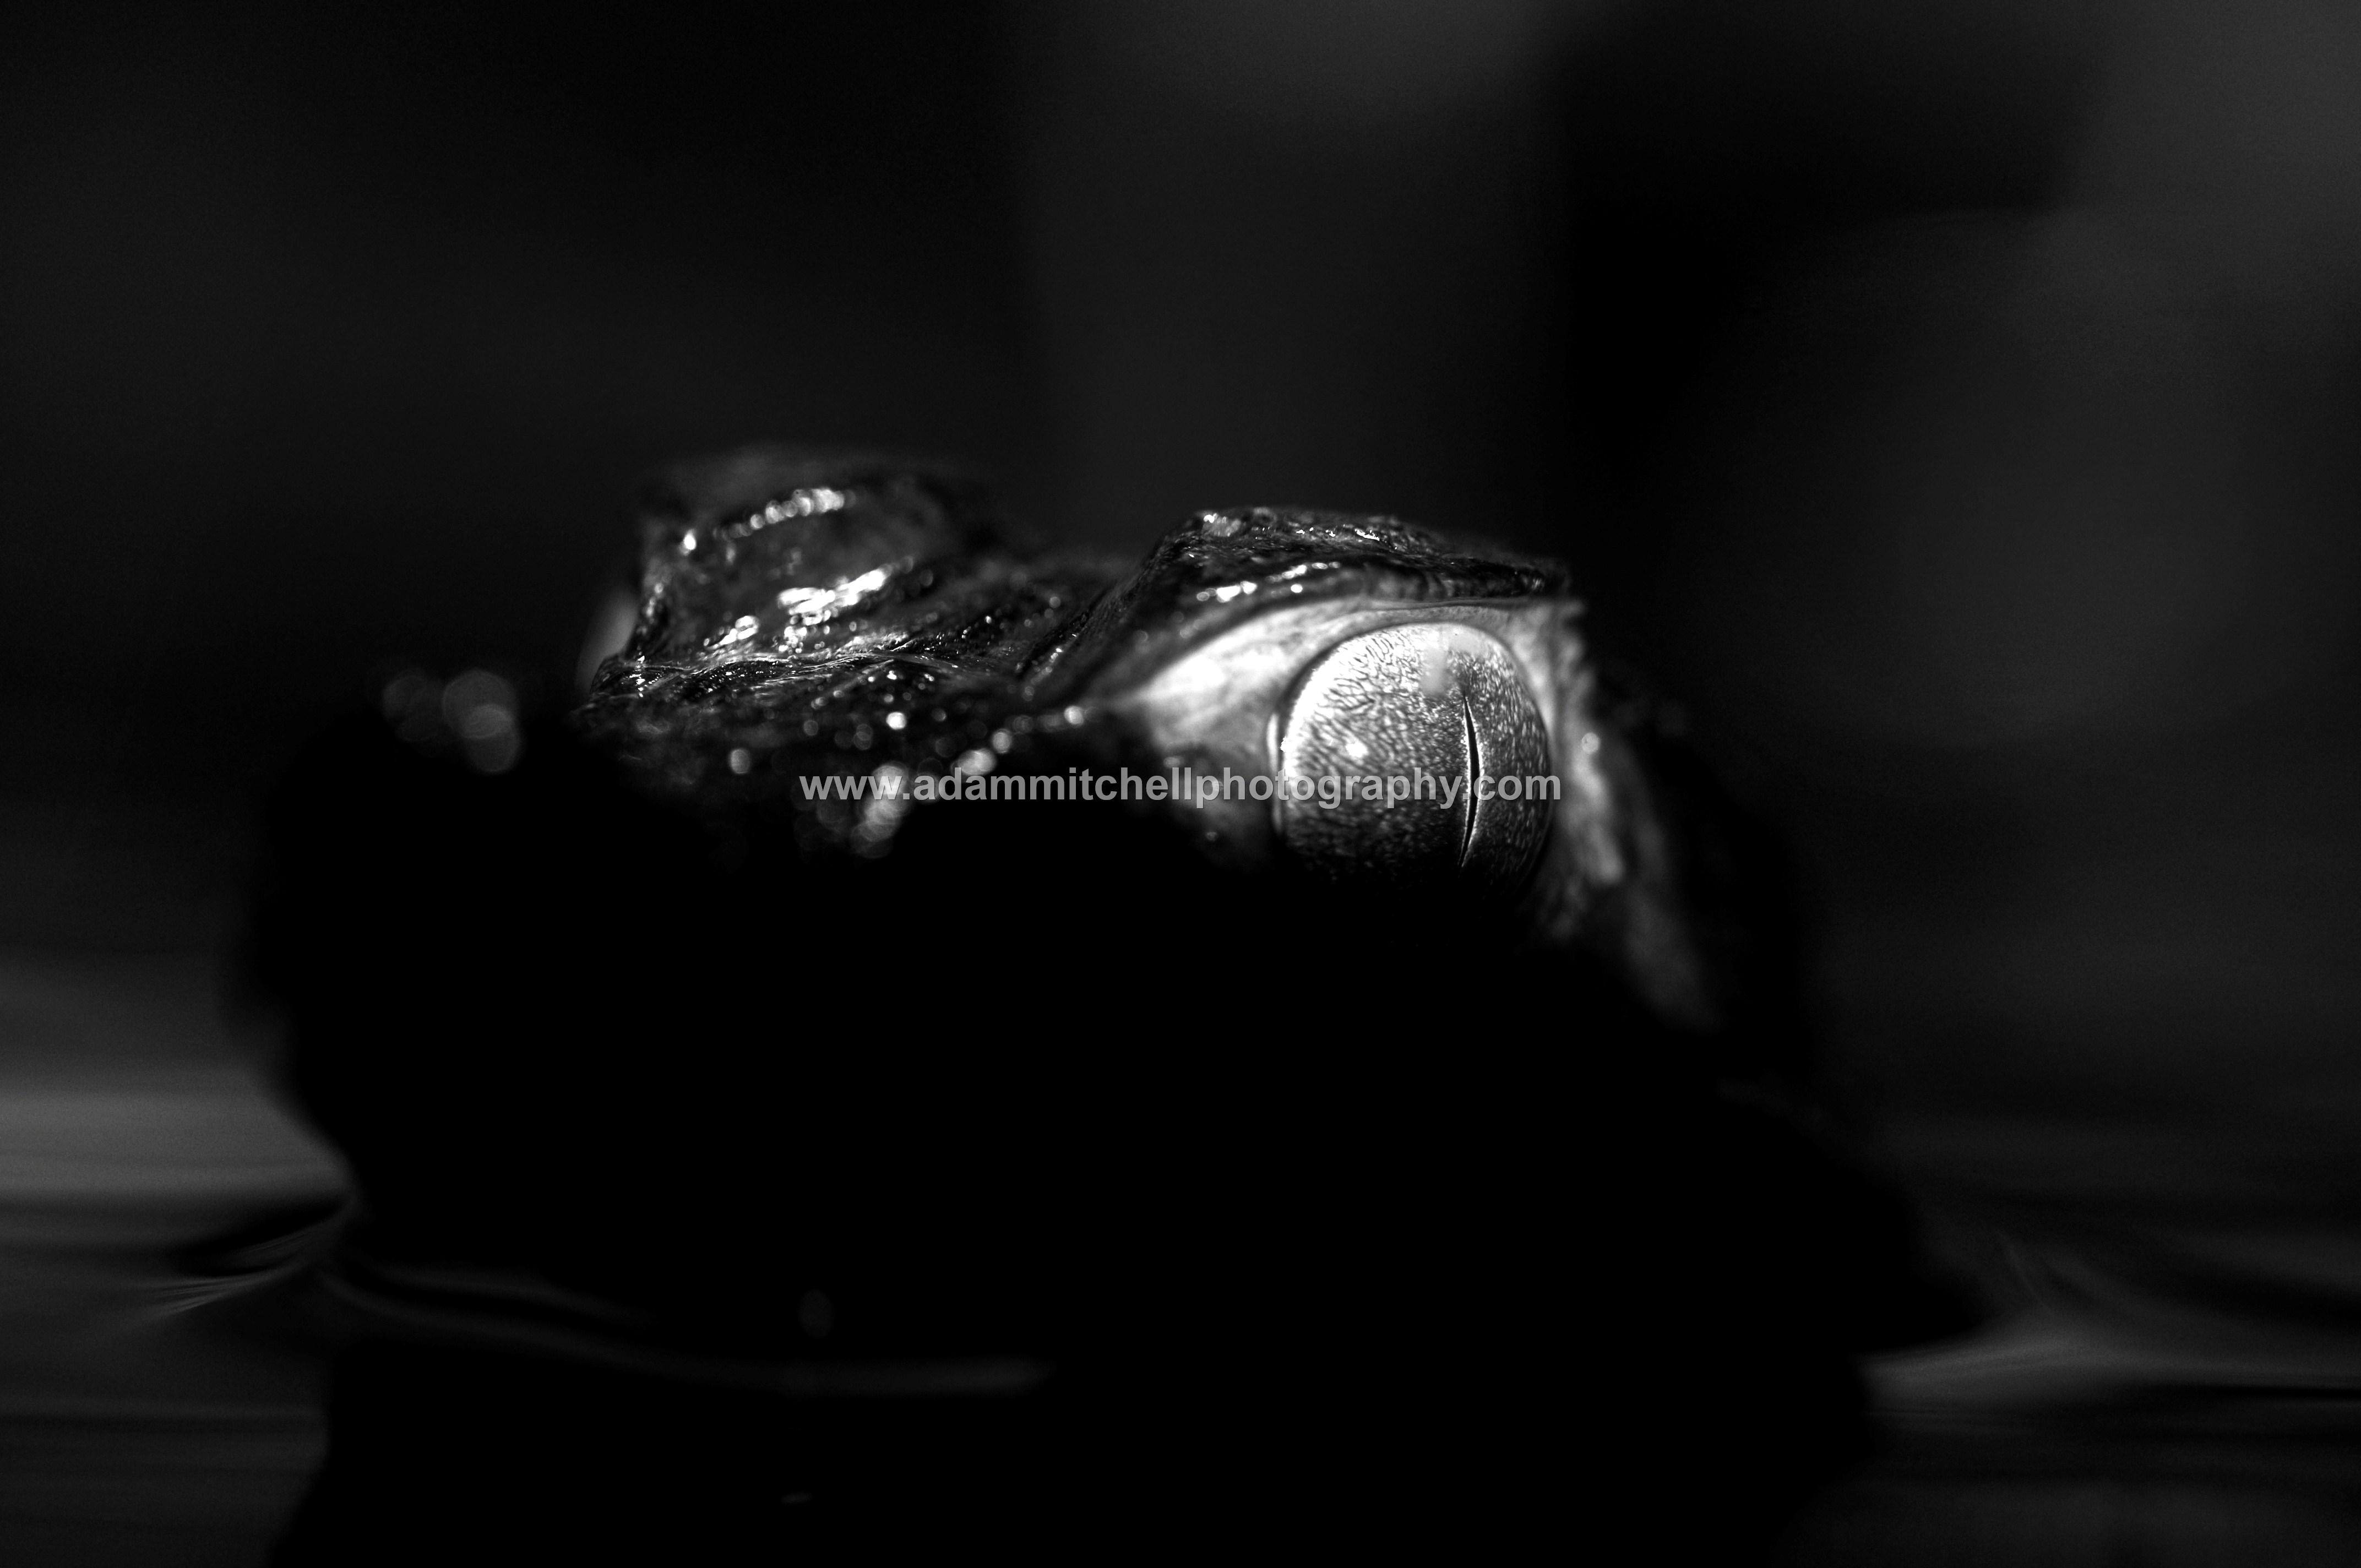 Dwarf caiman, Cheshire